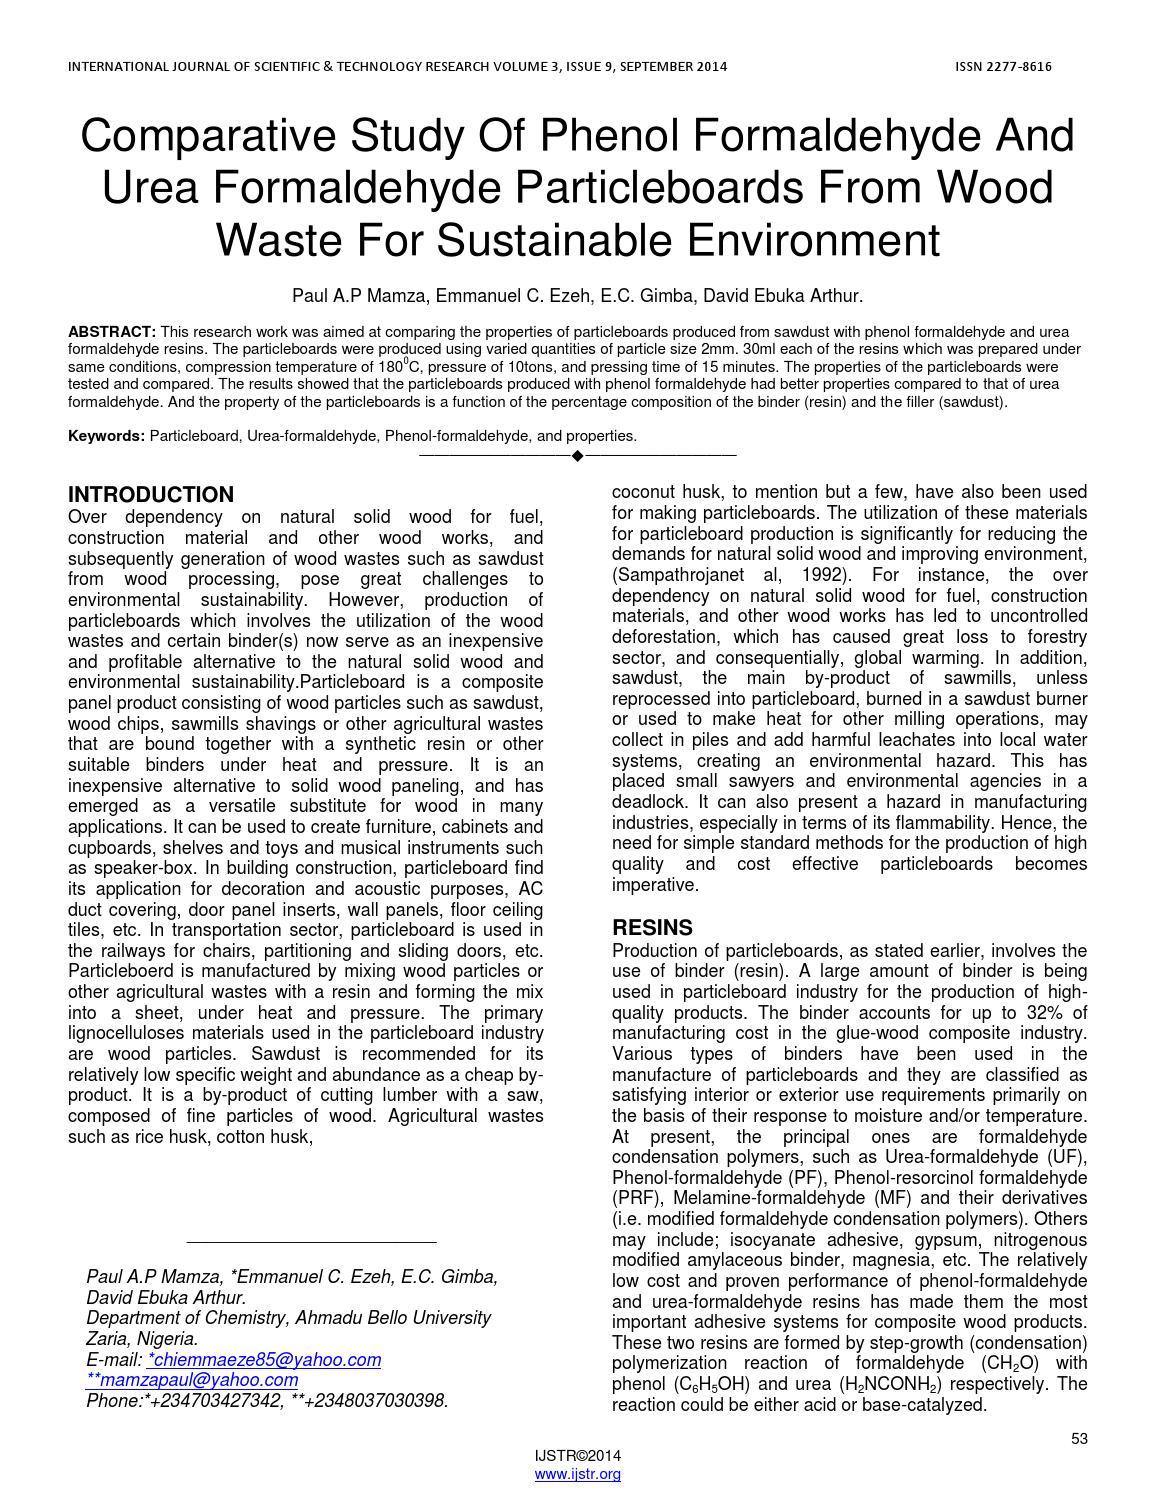 Comparative study of phenol formaldehyde and urea formaldehyde